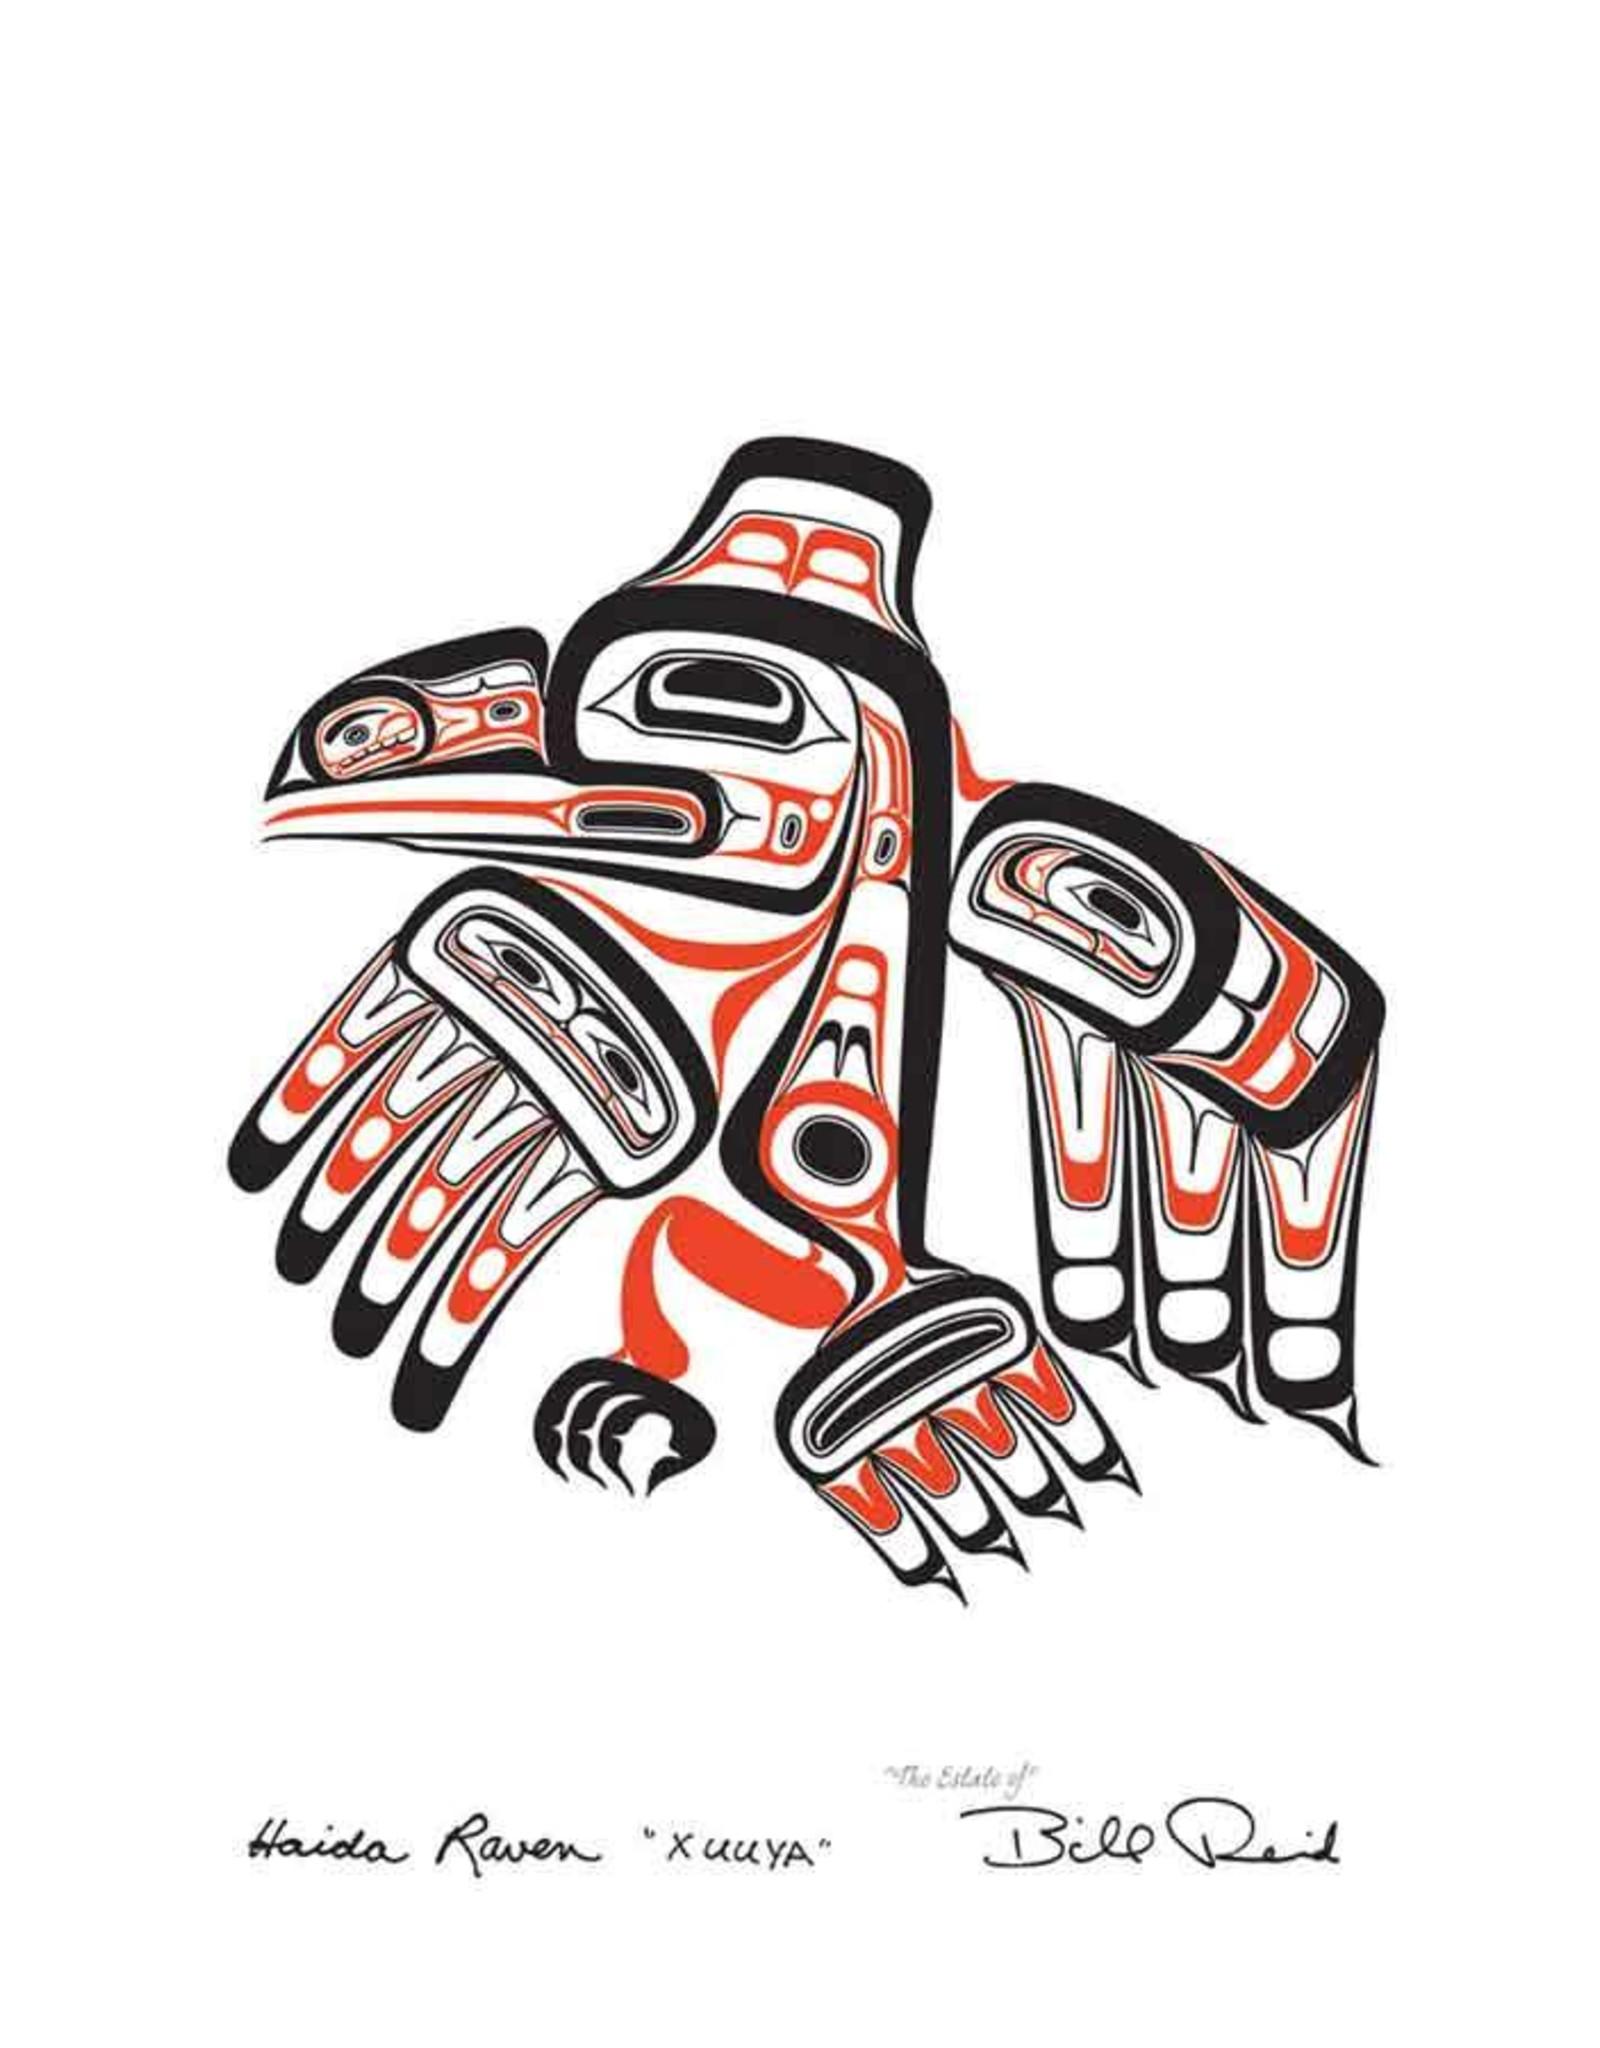 Haida Raven par Bill Reid 20025 Encadrée